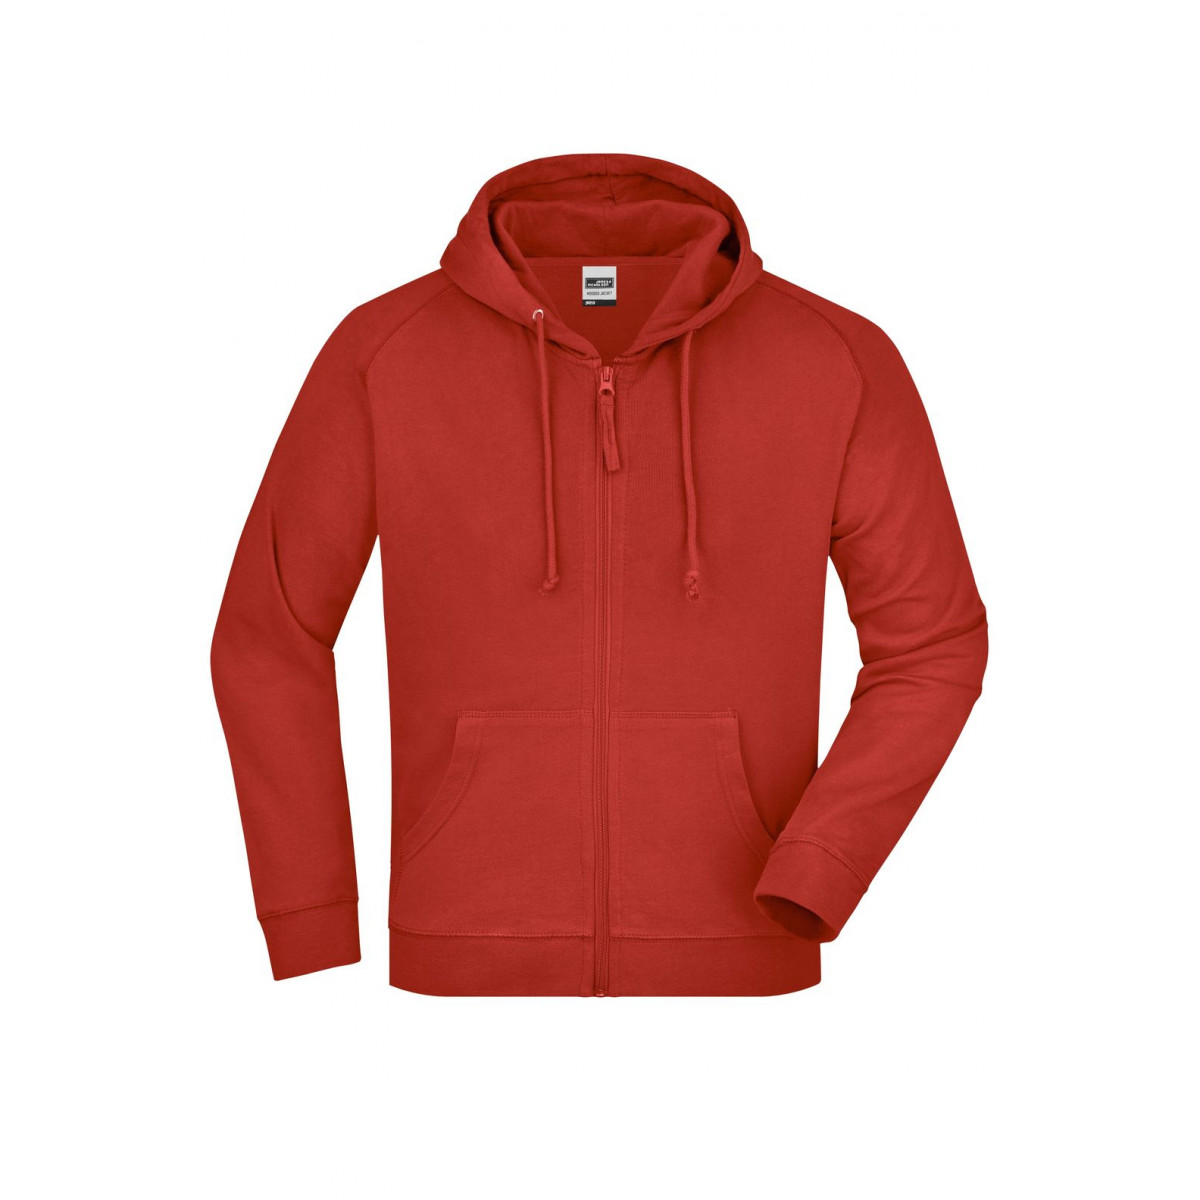 Толстовка мужская JN059 Hooded Jacket - Бордовый